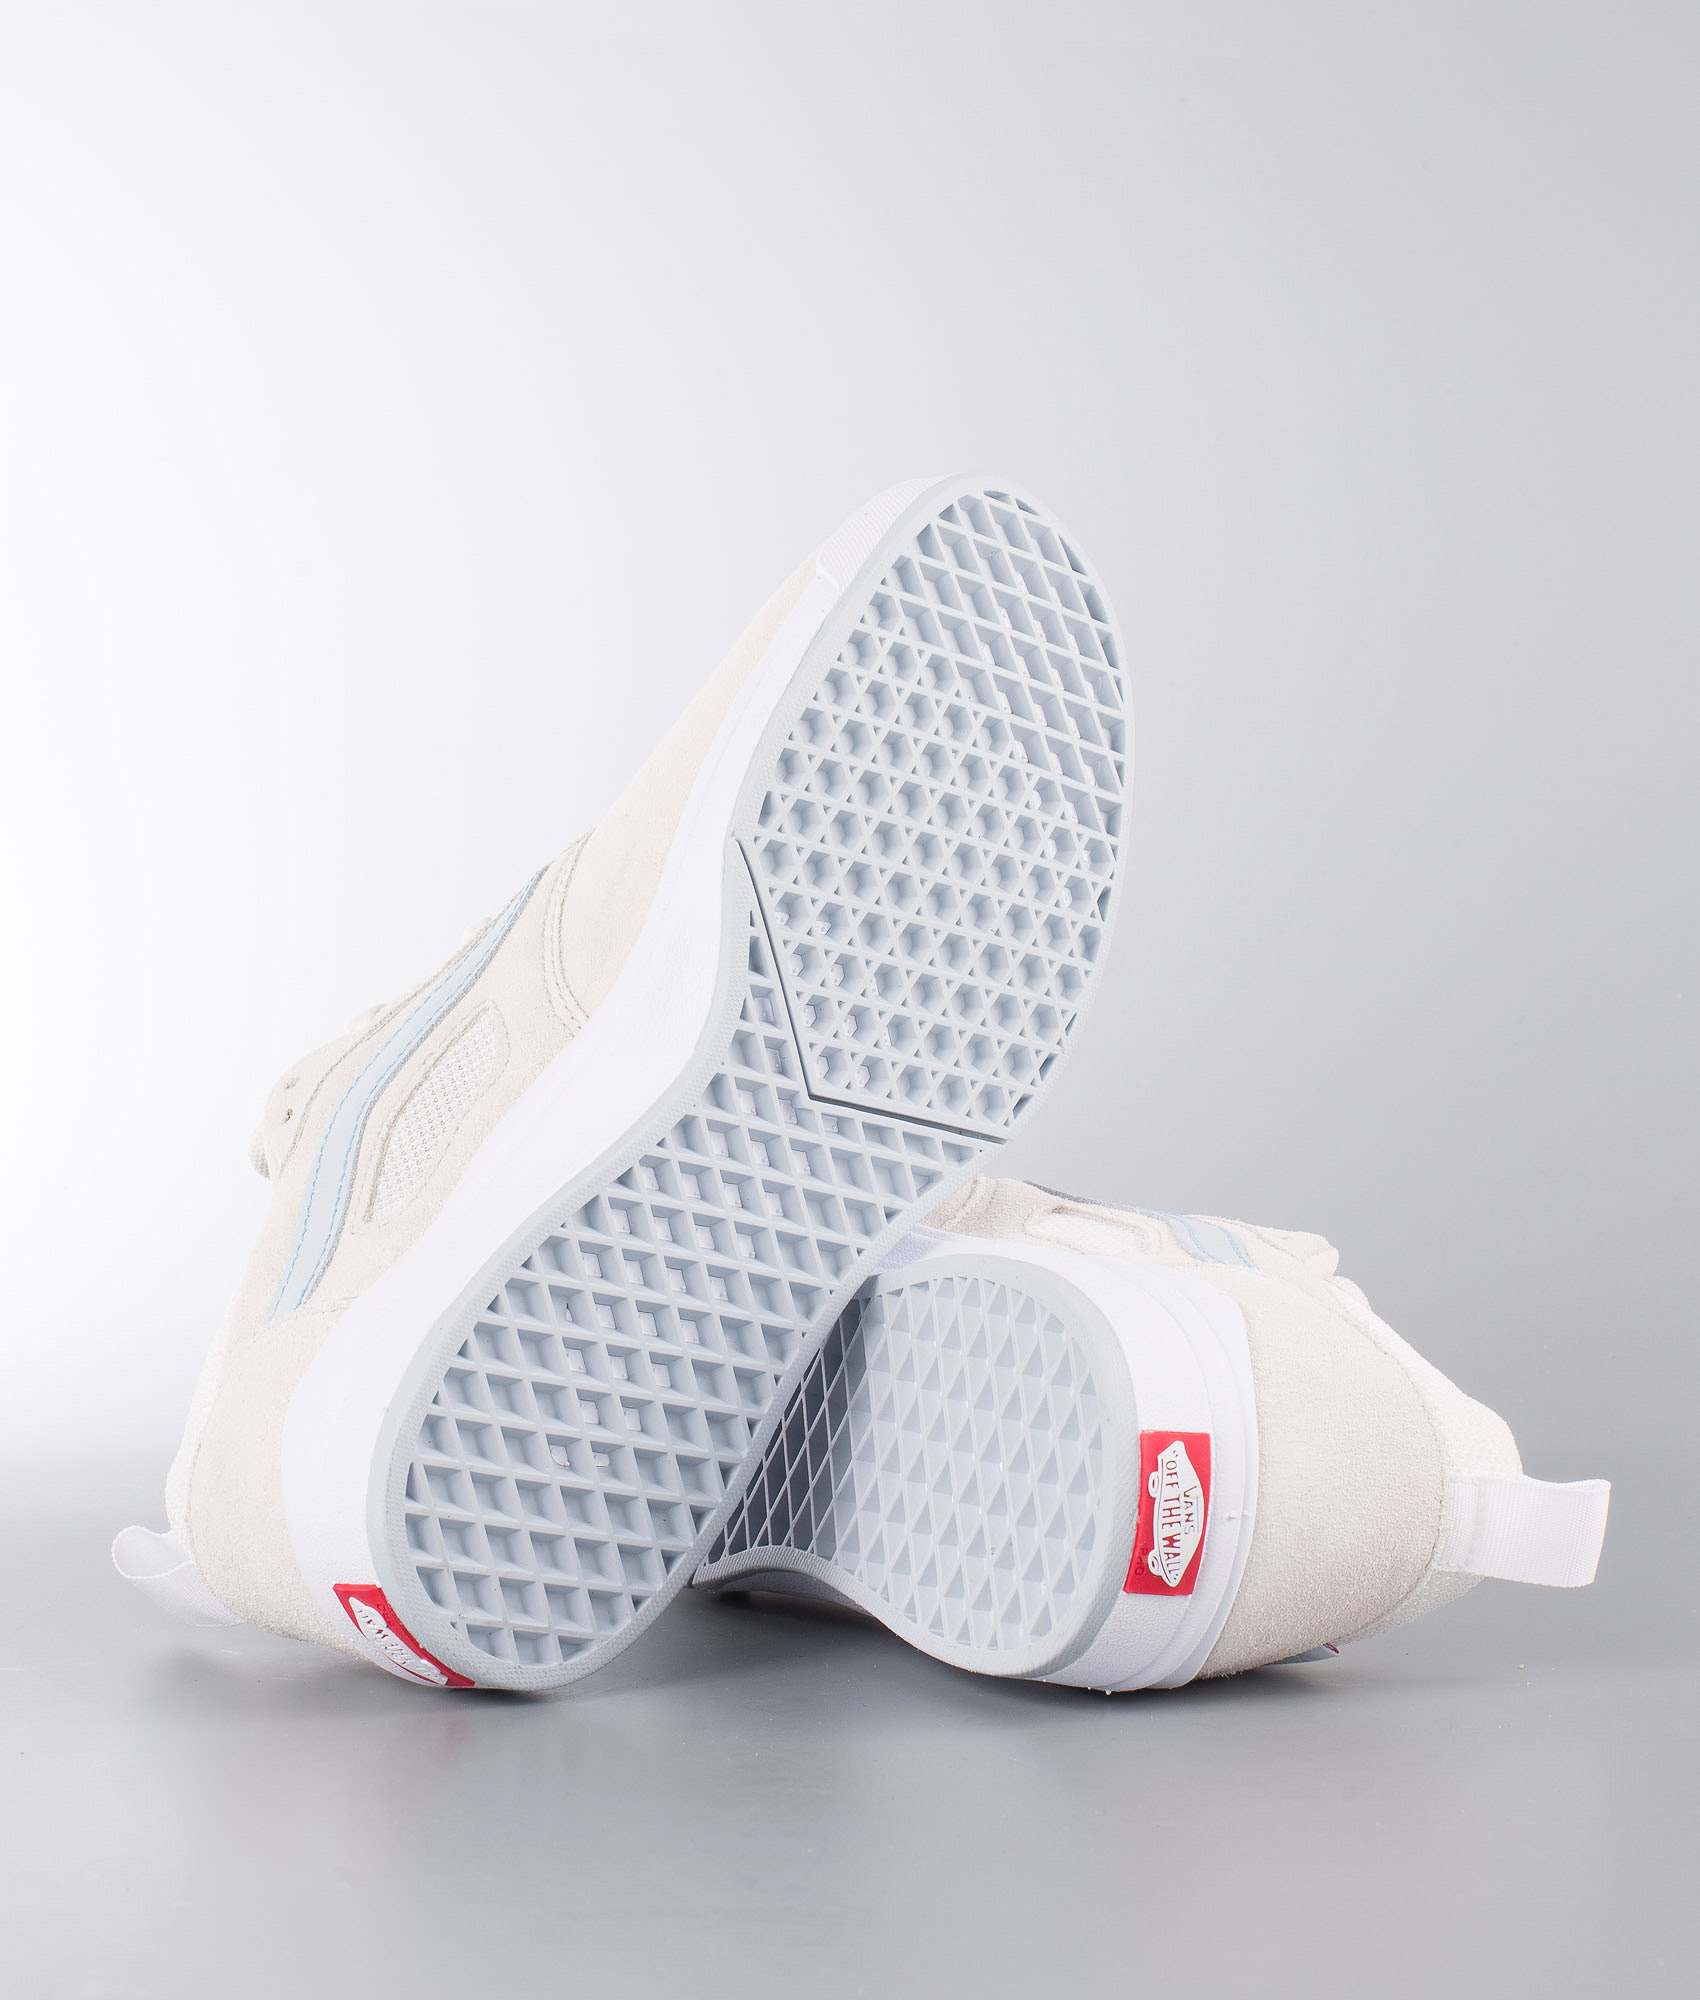 c1b1a40dbc Vans Ultrarange Pro Shoes (Center Court) Classic White Baby Blue ...